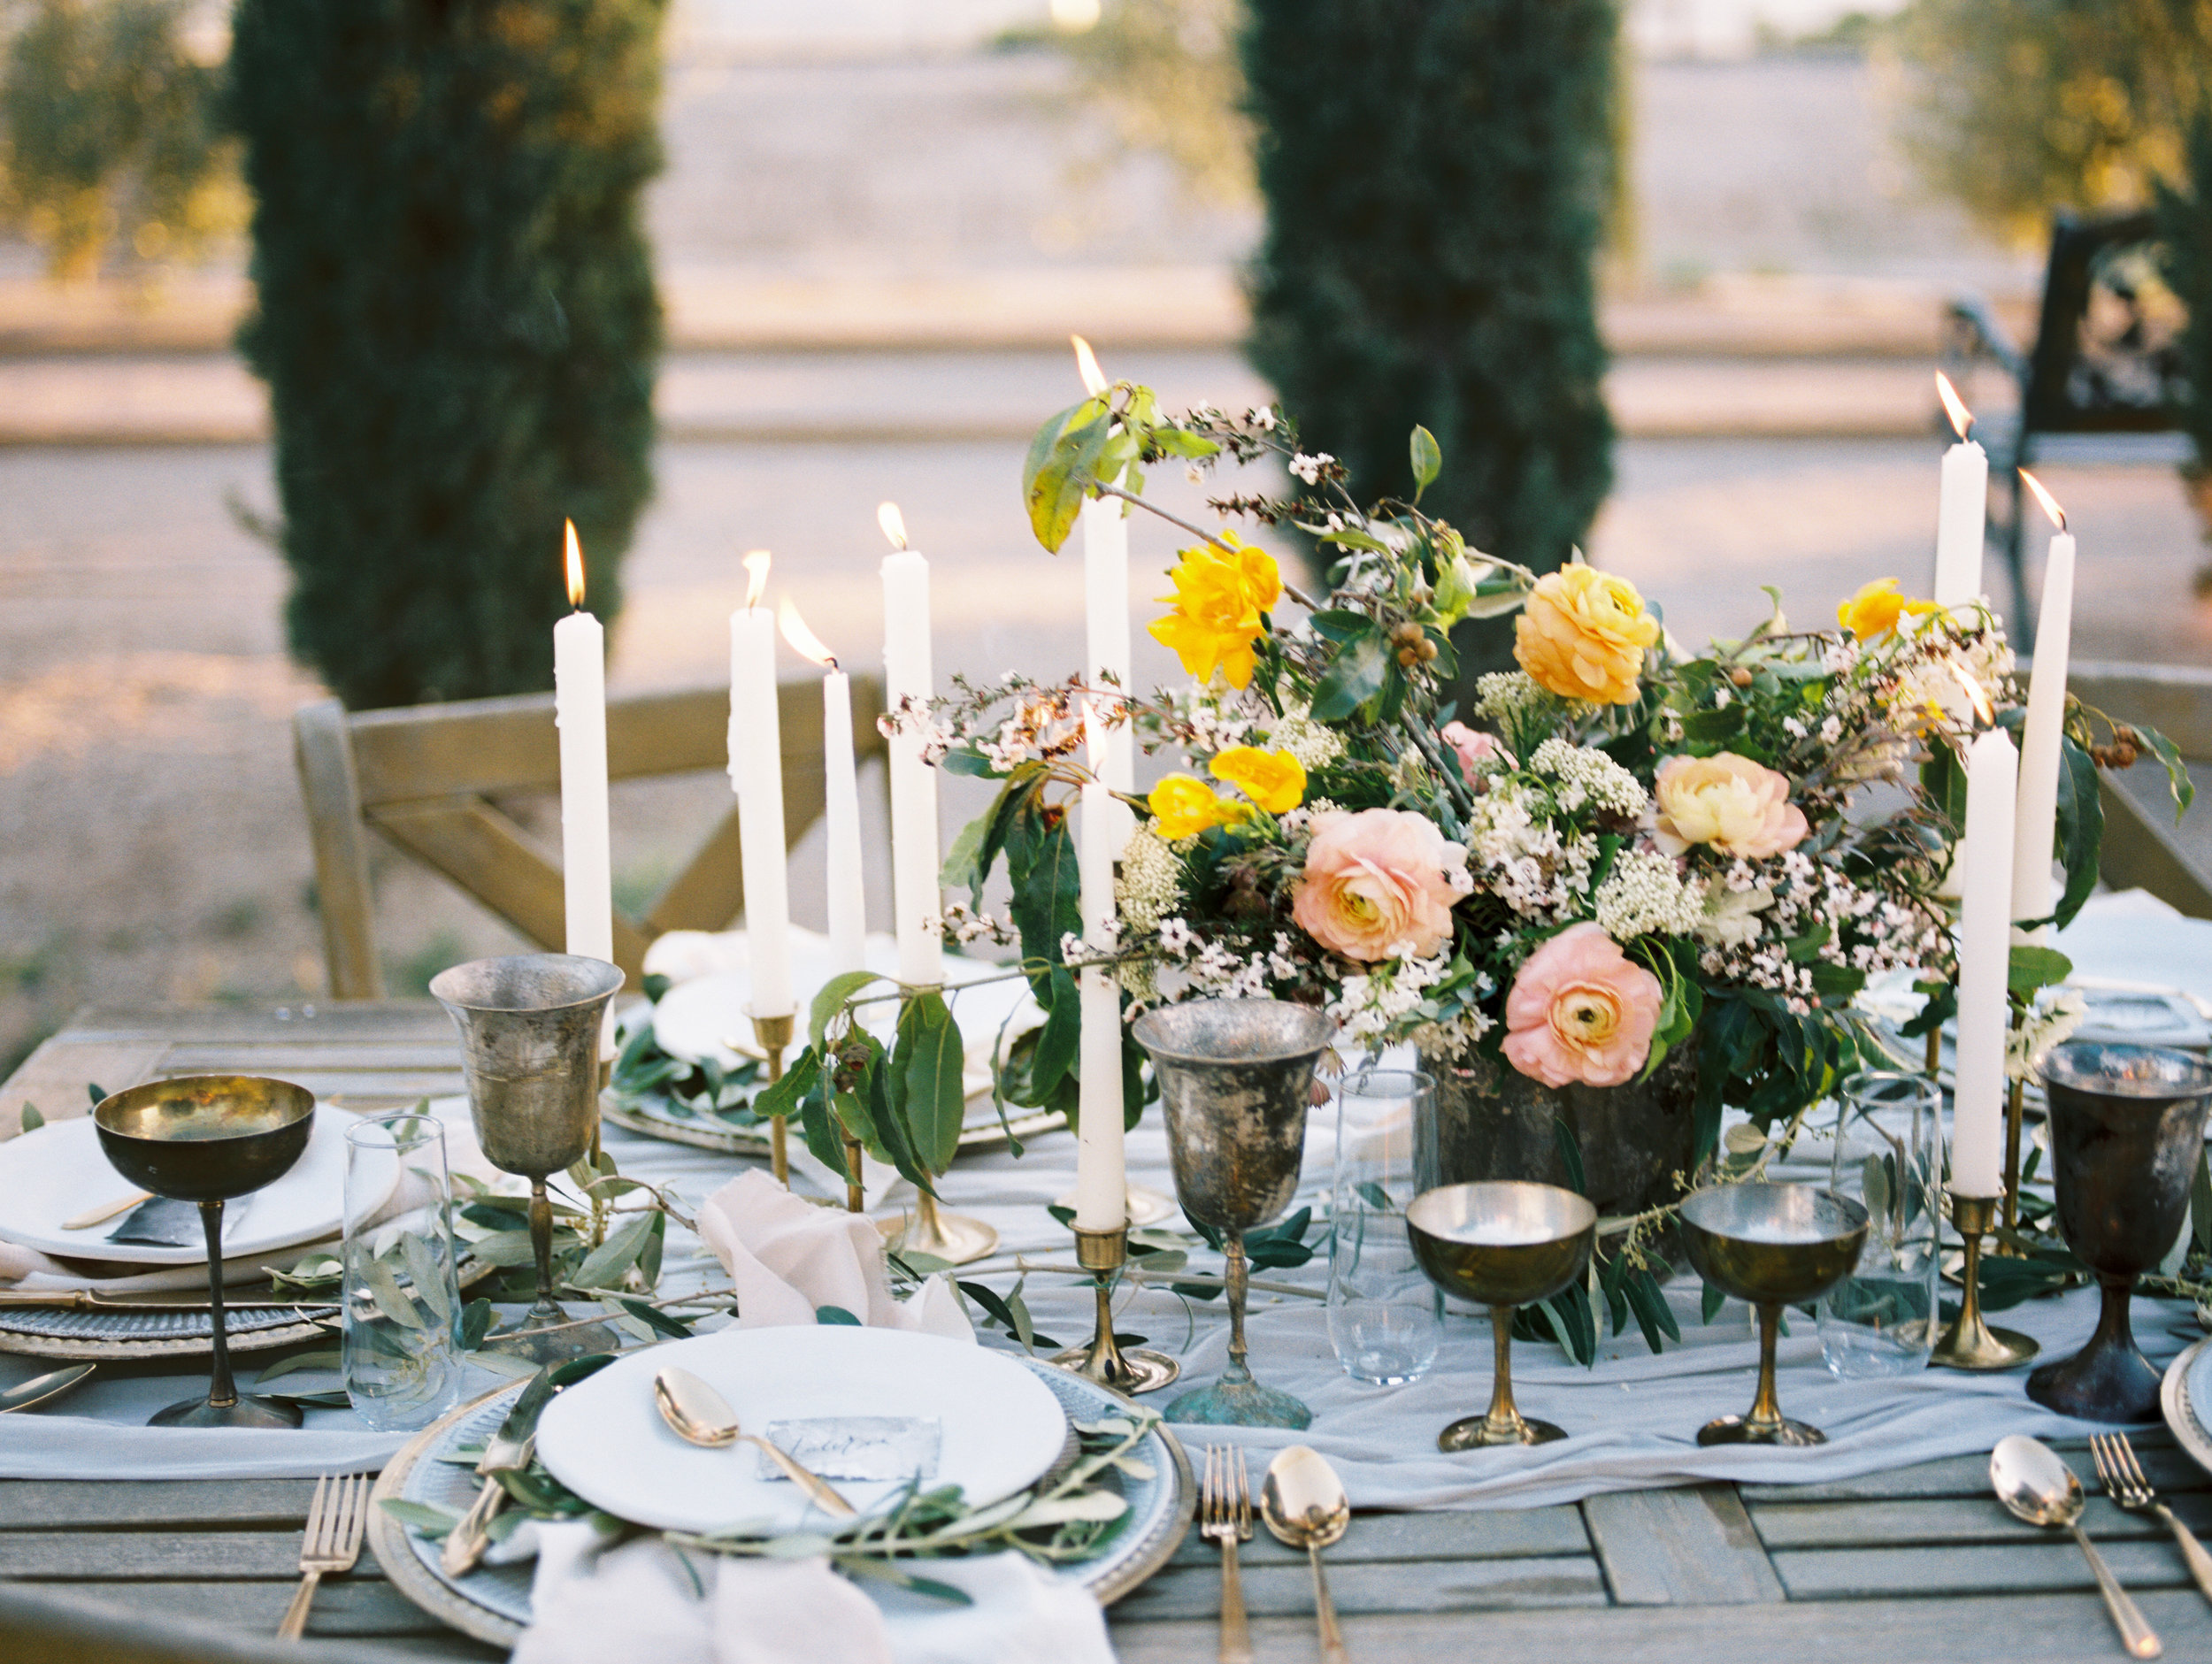 Olive Mill Wedding Inspiration - Ranunculus Centerpiece